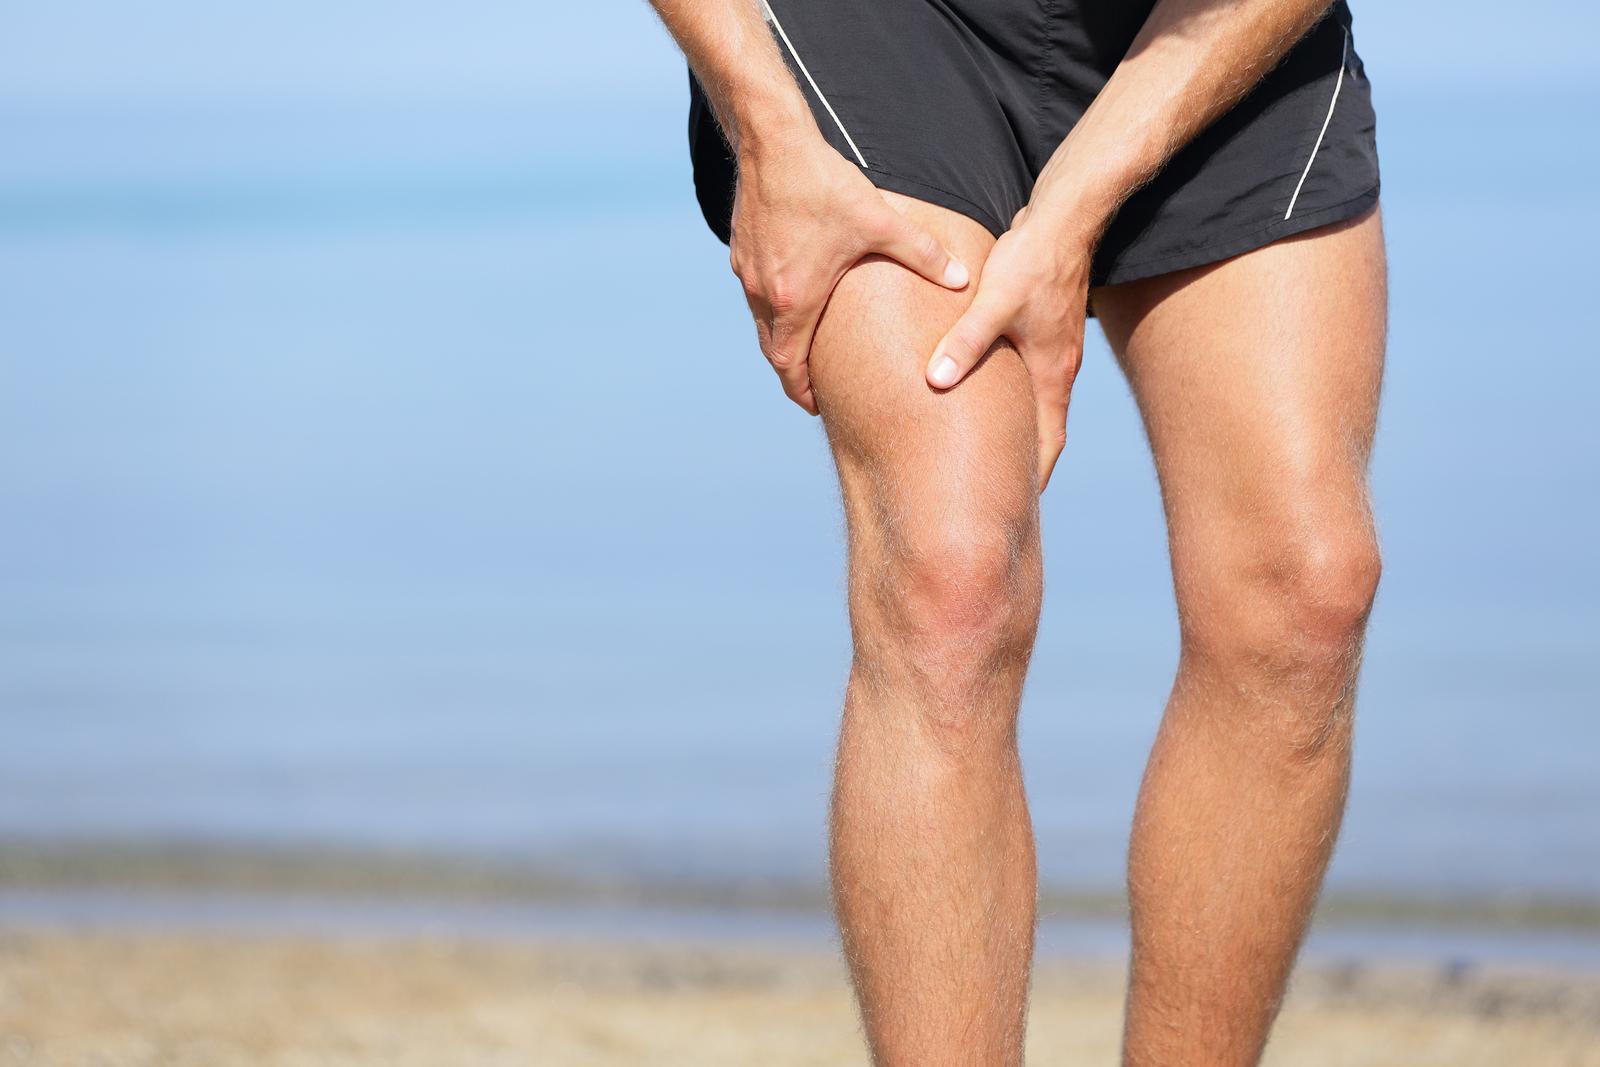 sports_injuries.jpg